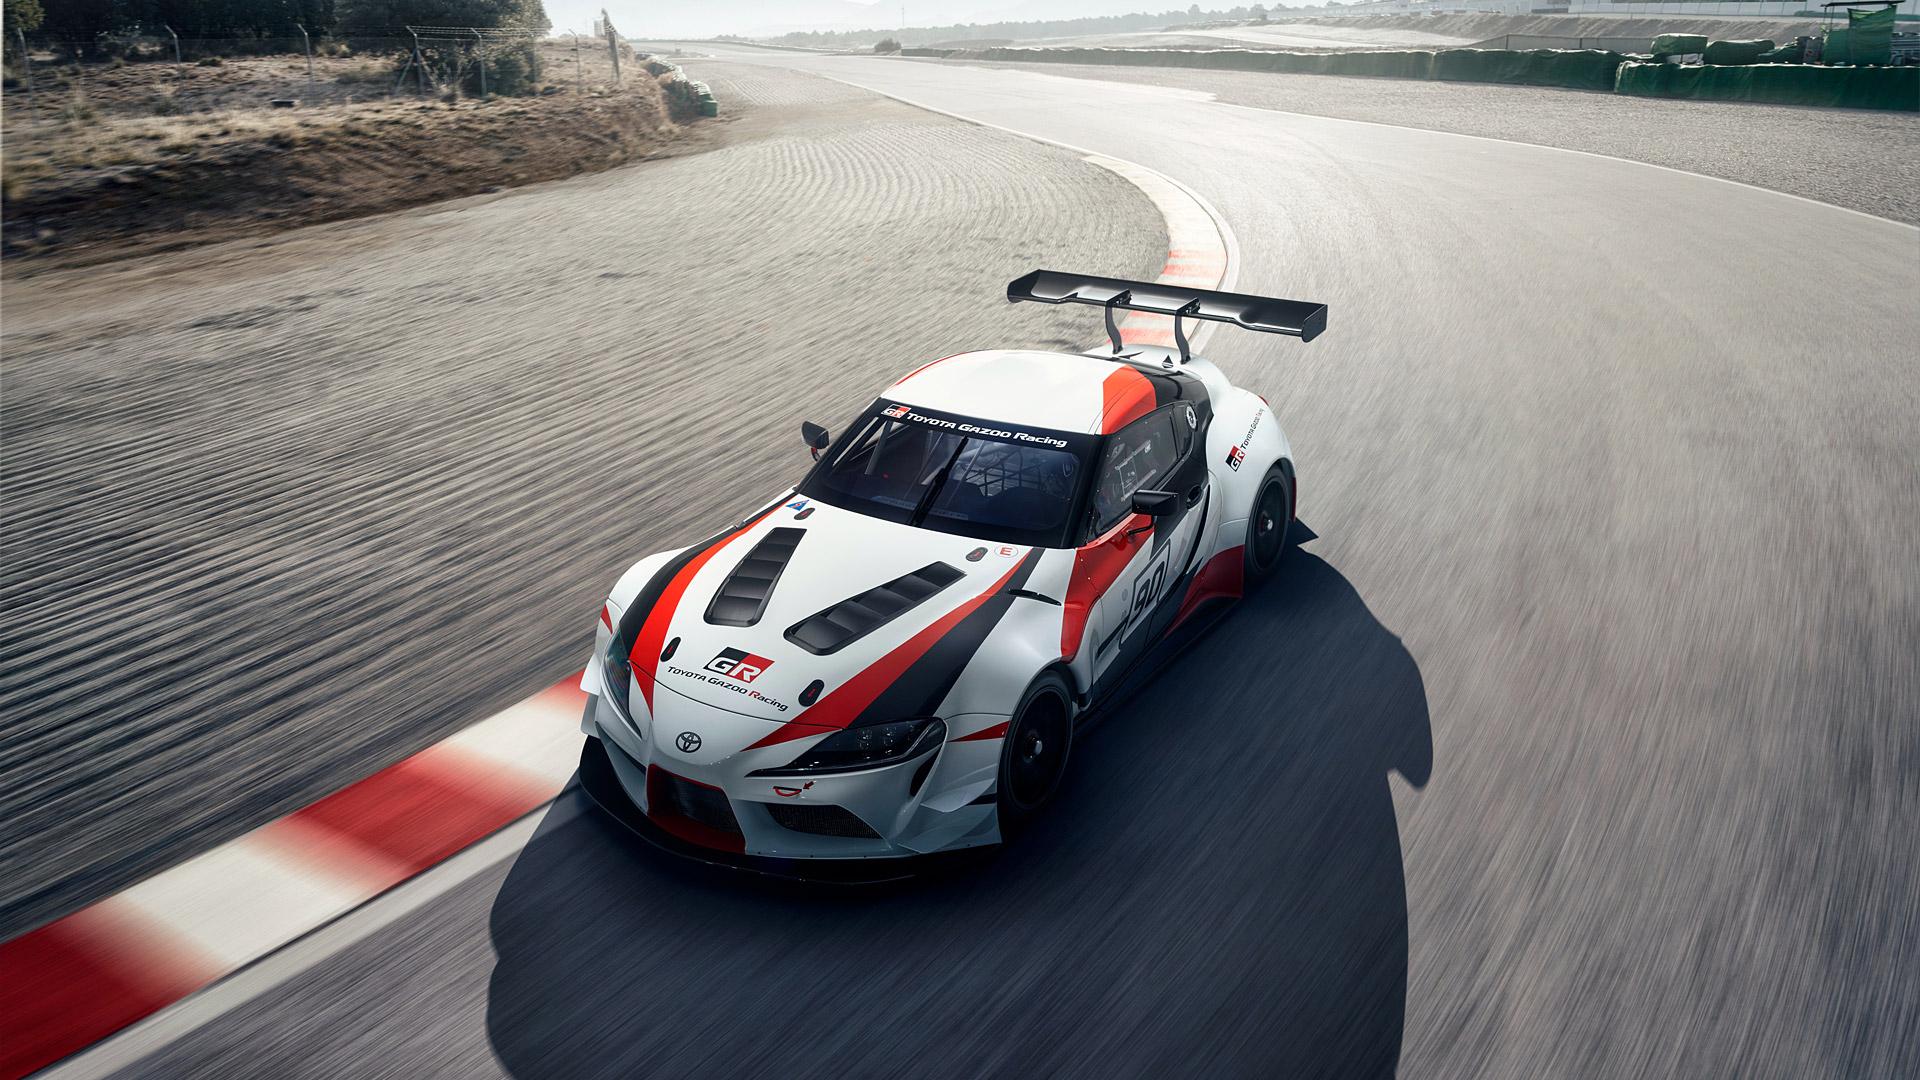 Toyota Gr Supra Racing - Supra Gran Turismo Sport , HD Wallpaper & Backgrounds